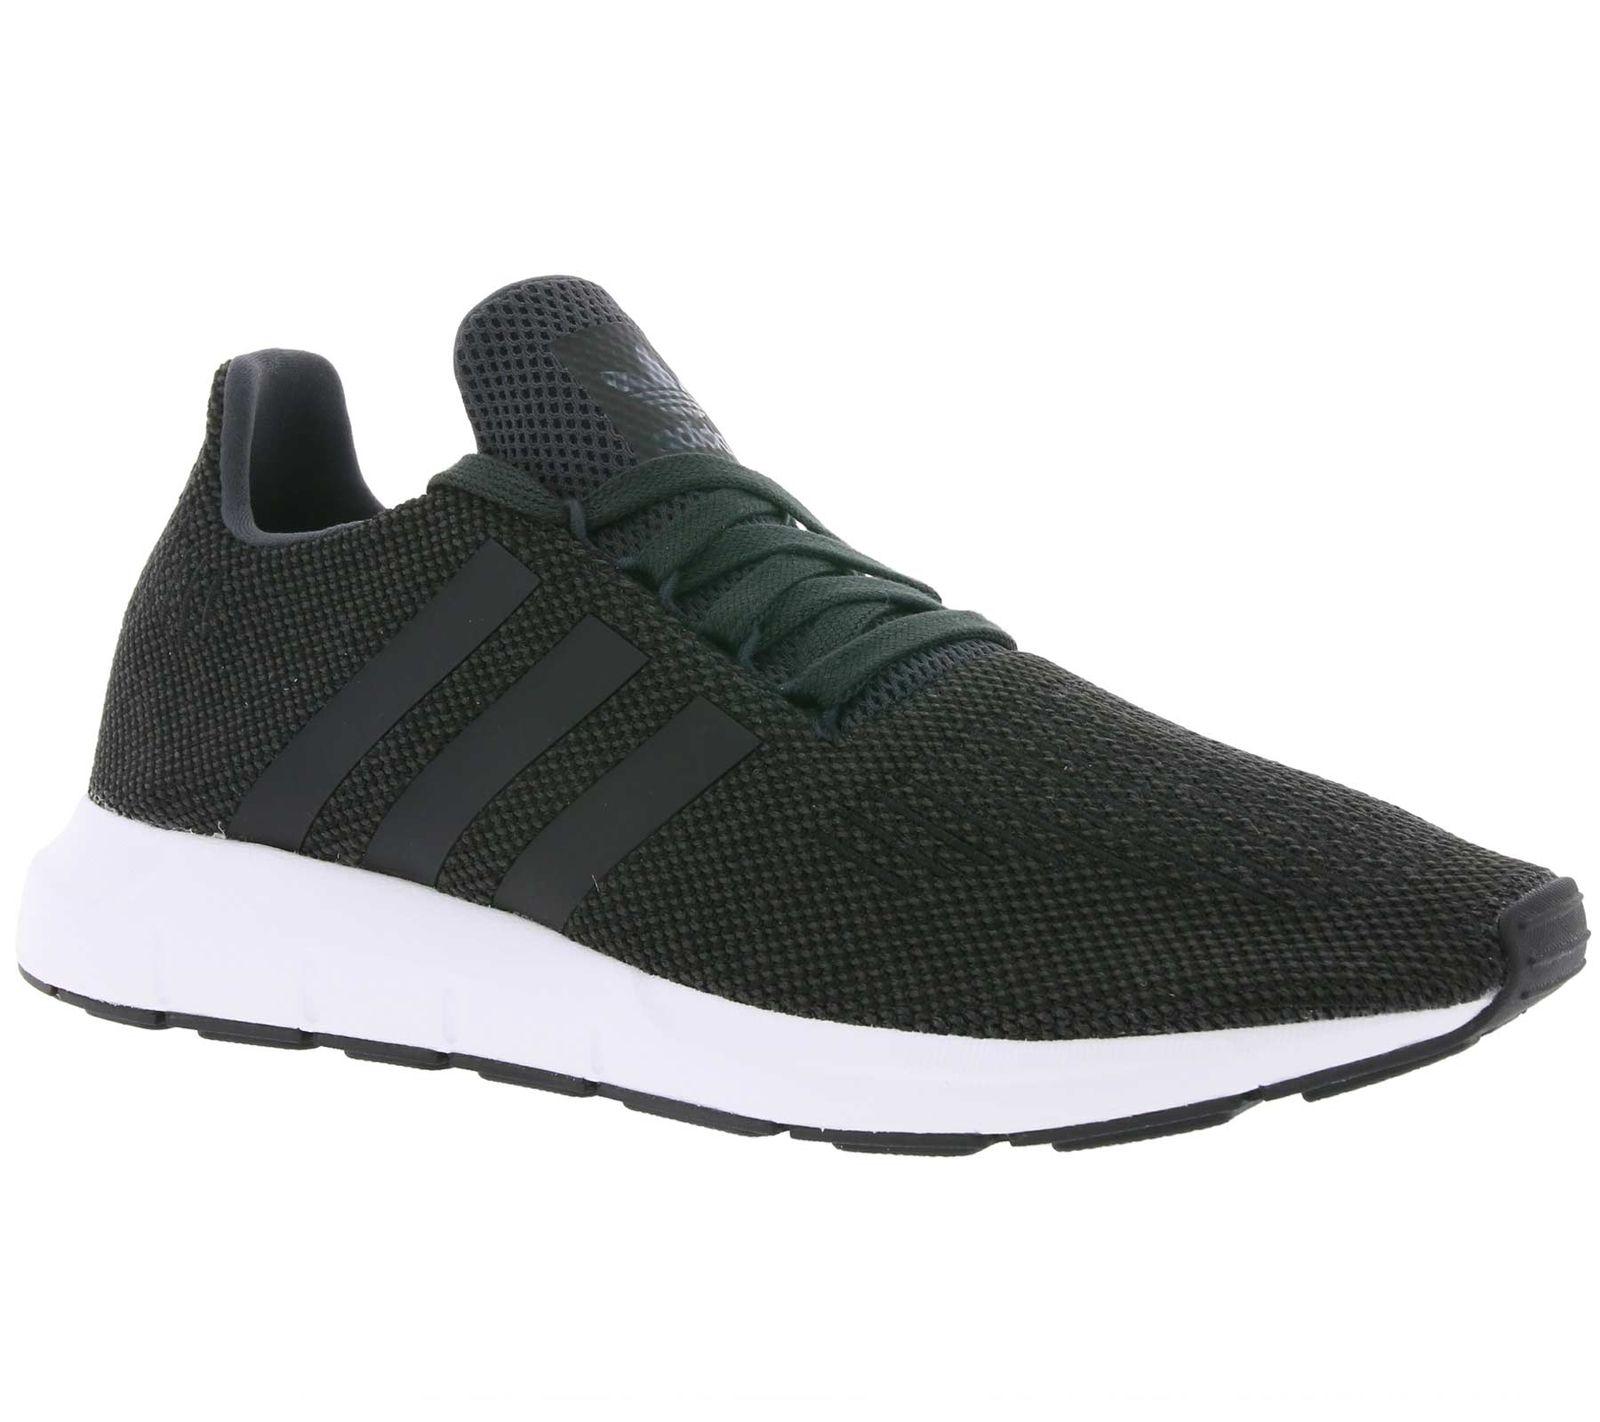 adidas Originals Herren Sneaker Swift Run schwarz @ebayPLUS